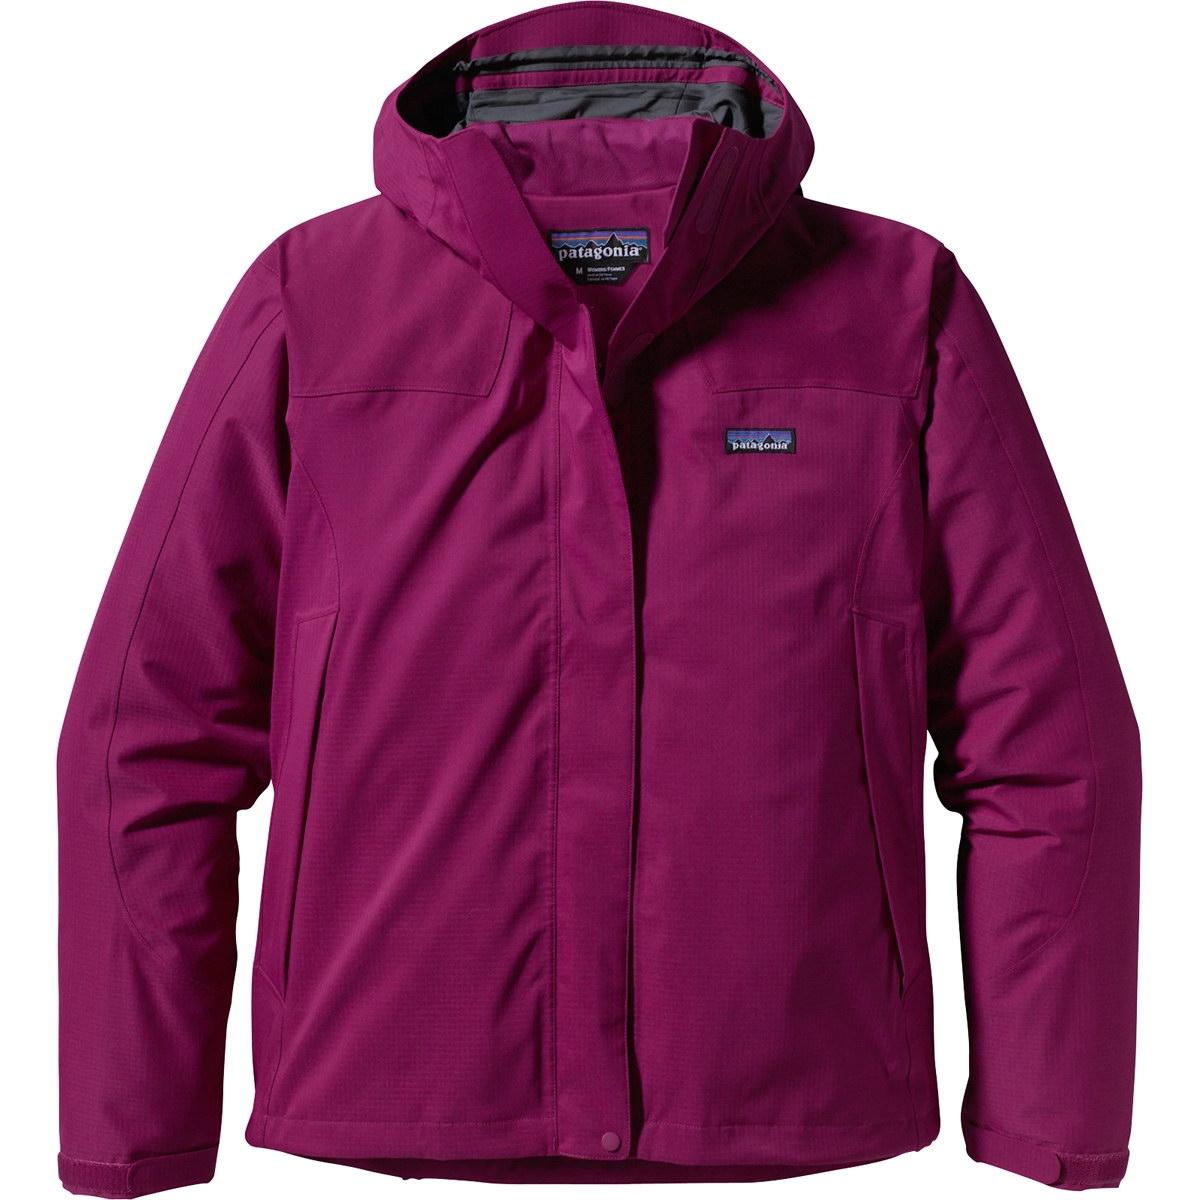 Patagonia Angebote –  40 Prozent Rabatt auf Patagonia Women's Storm Jacket – Winterjacke